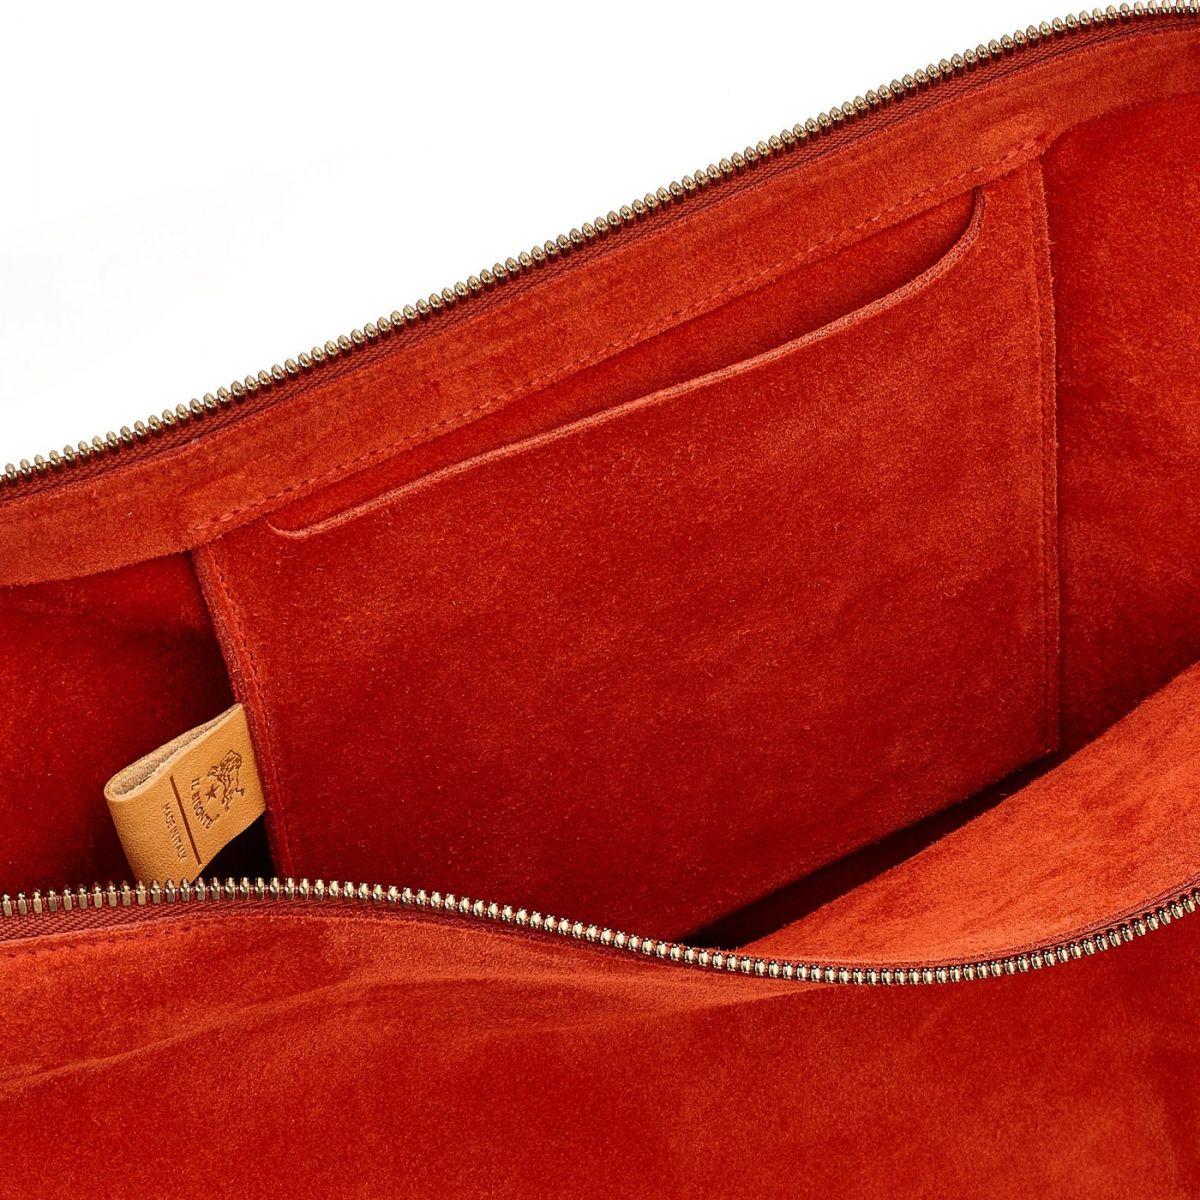 Women's Shoulder Bag  in Cowhide Leather BSH082 color Gazpacho | Details